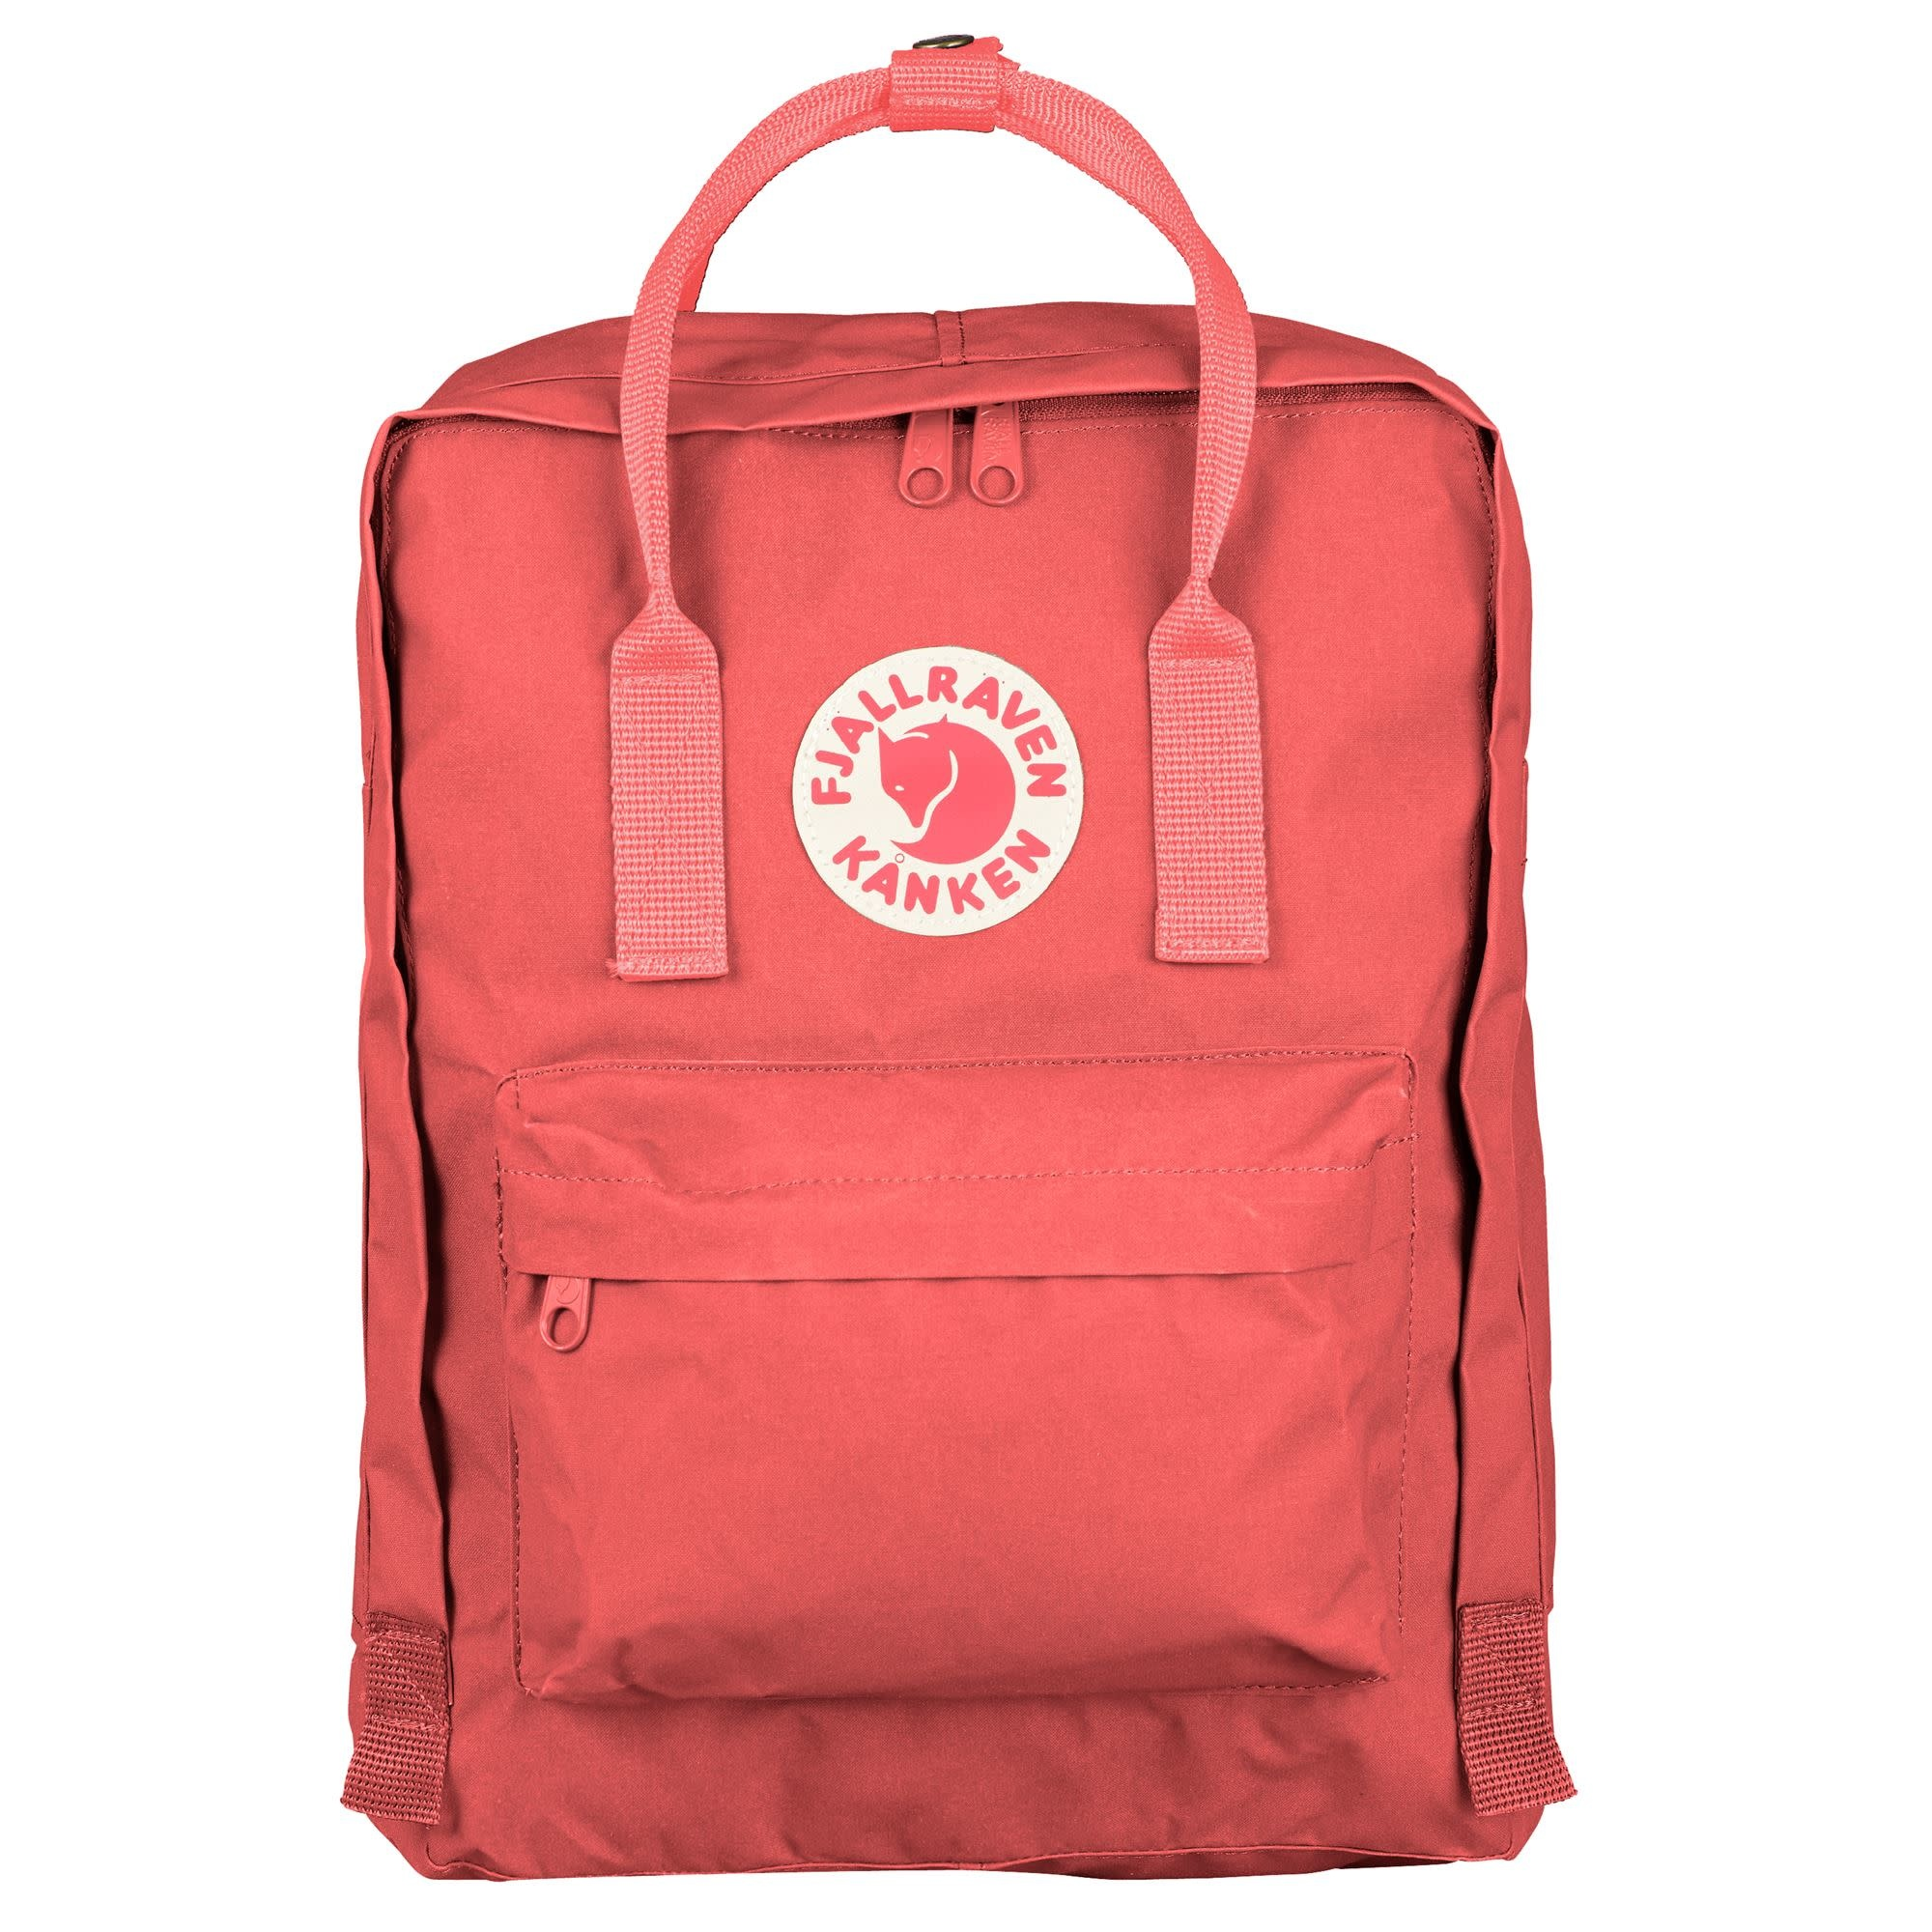 Fjallraven Arctic Fox LLC Fjallraven Kanken Classic Backpack - Peach Pink